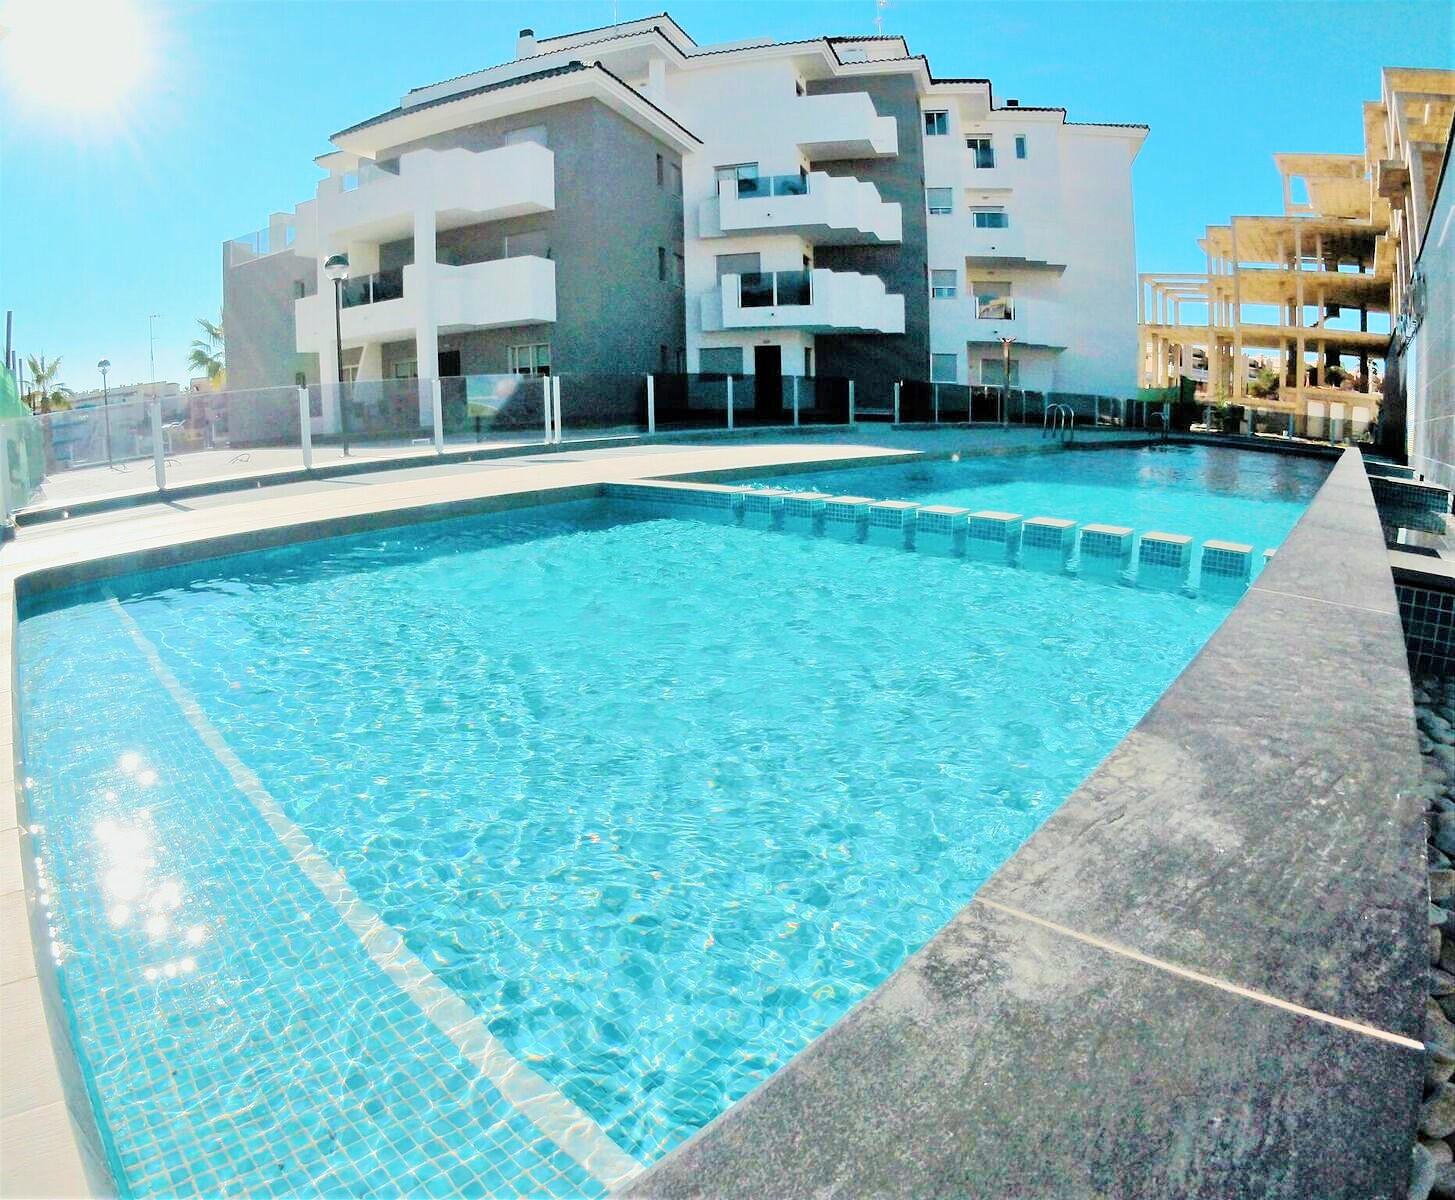 1 bedroom apartment For Sale in La Zenia - Main Image